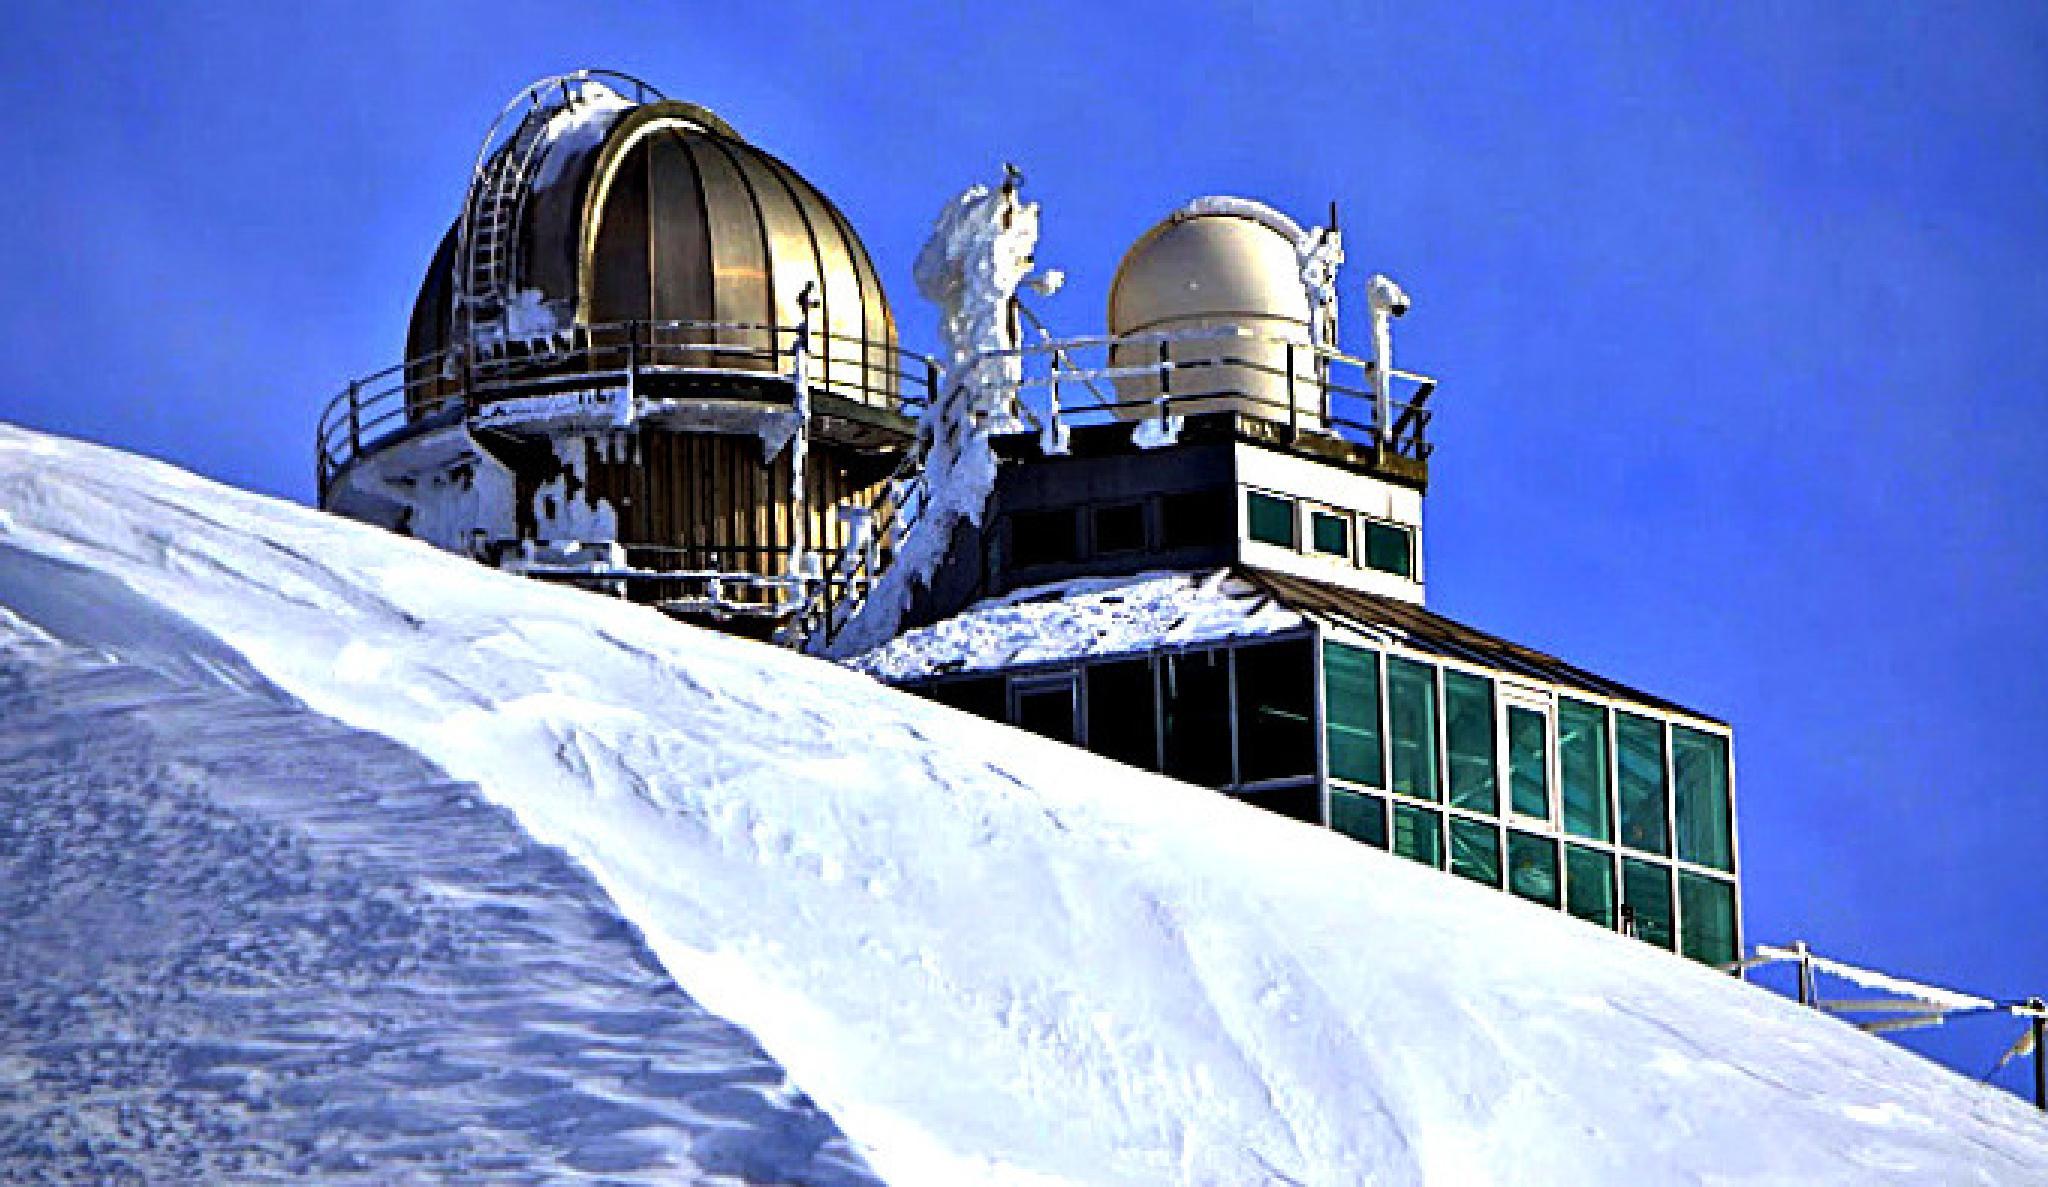 """Jungfrau-Joch;Planetarium."" by BauerStefan"